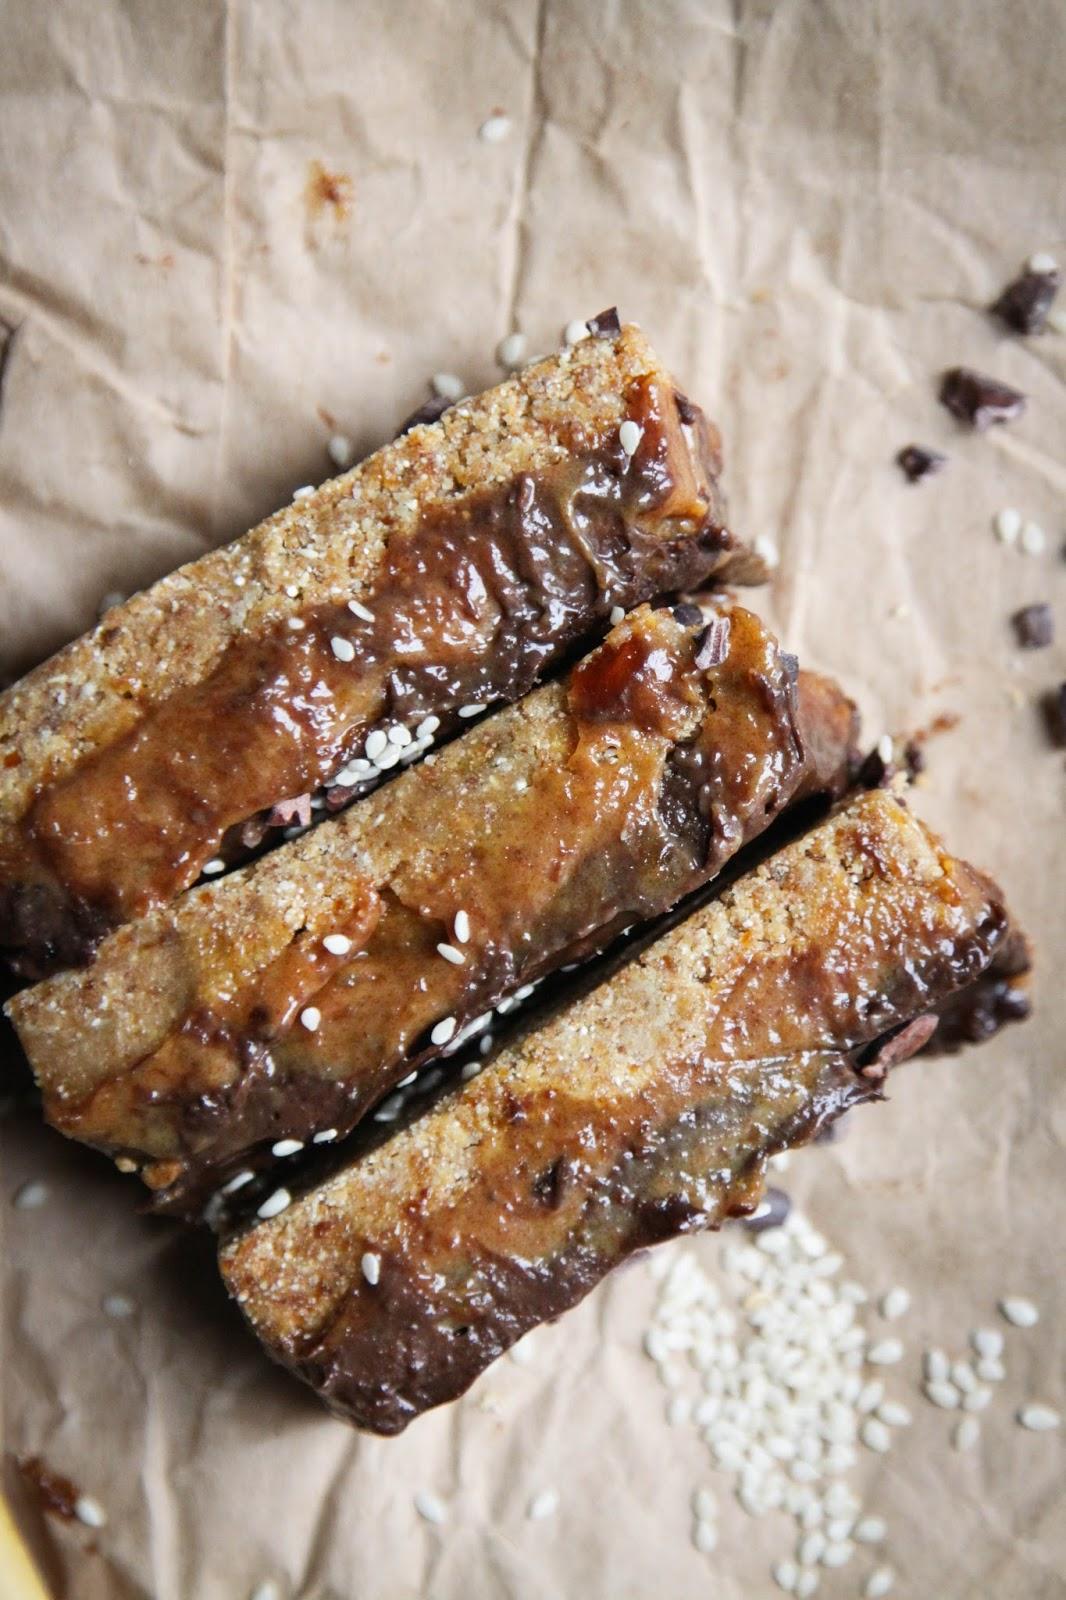 This Rawsome Vegan Life Gooey Caramel Chocolate Bars With